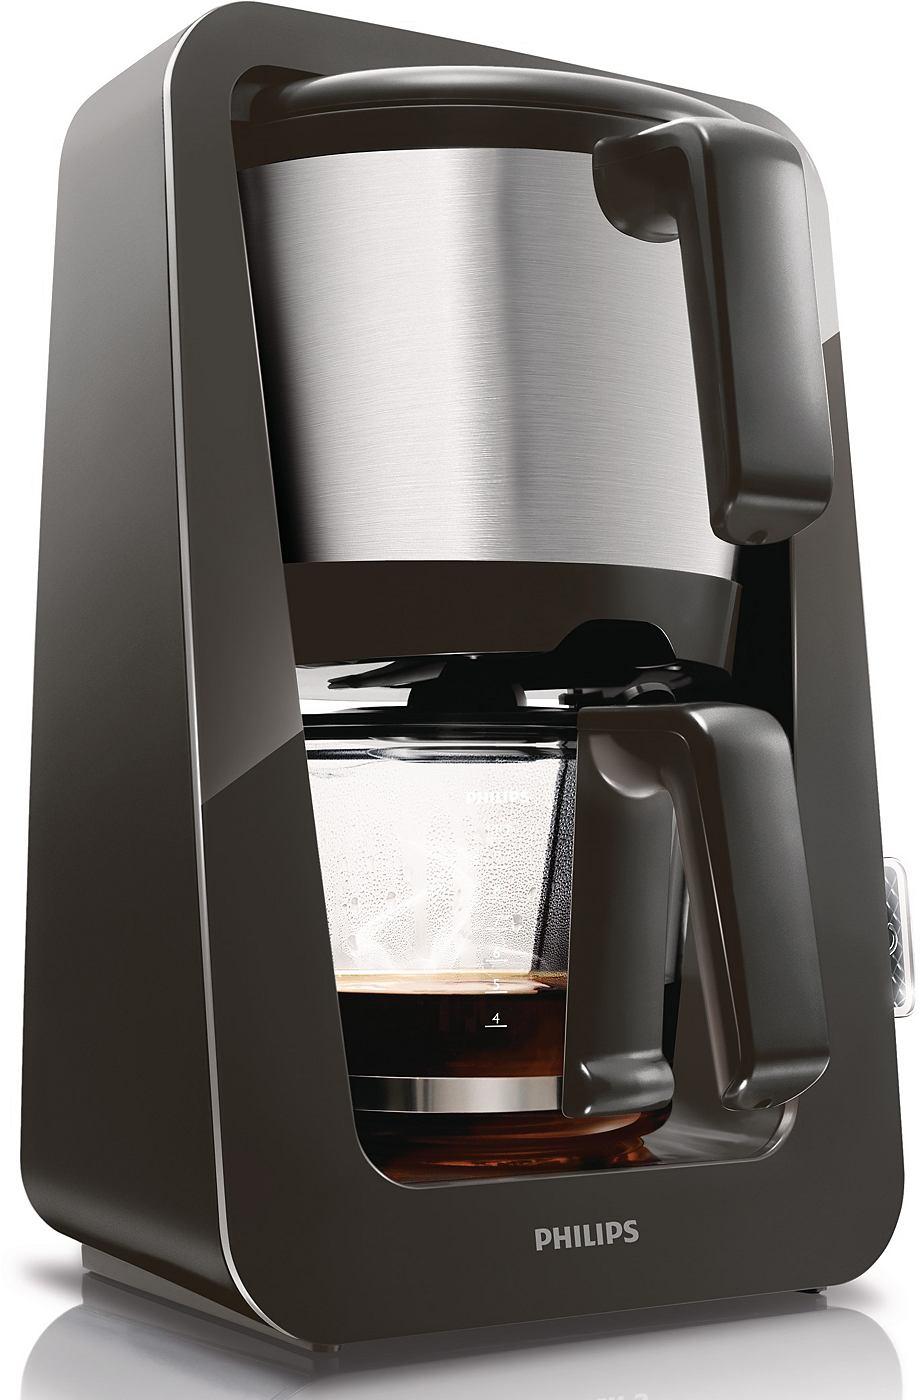 Philips Filterkaffeemaschine Avance HD7688/20